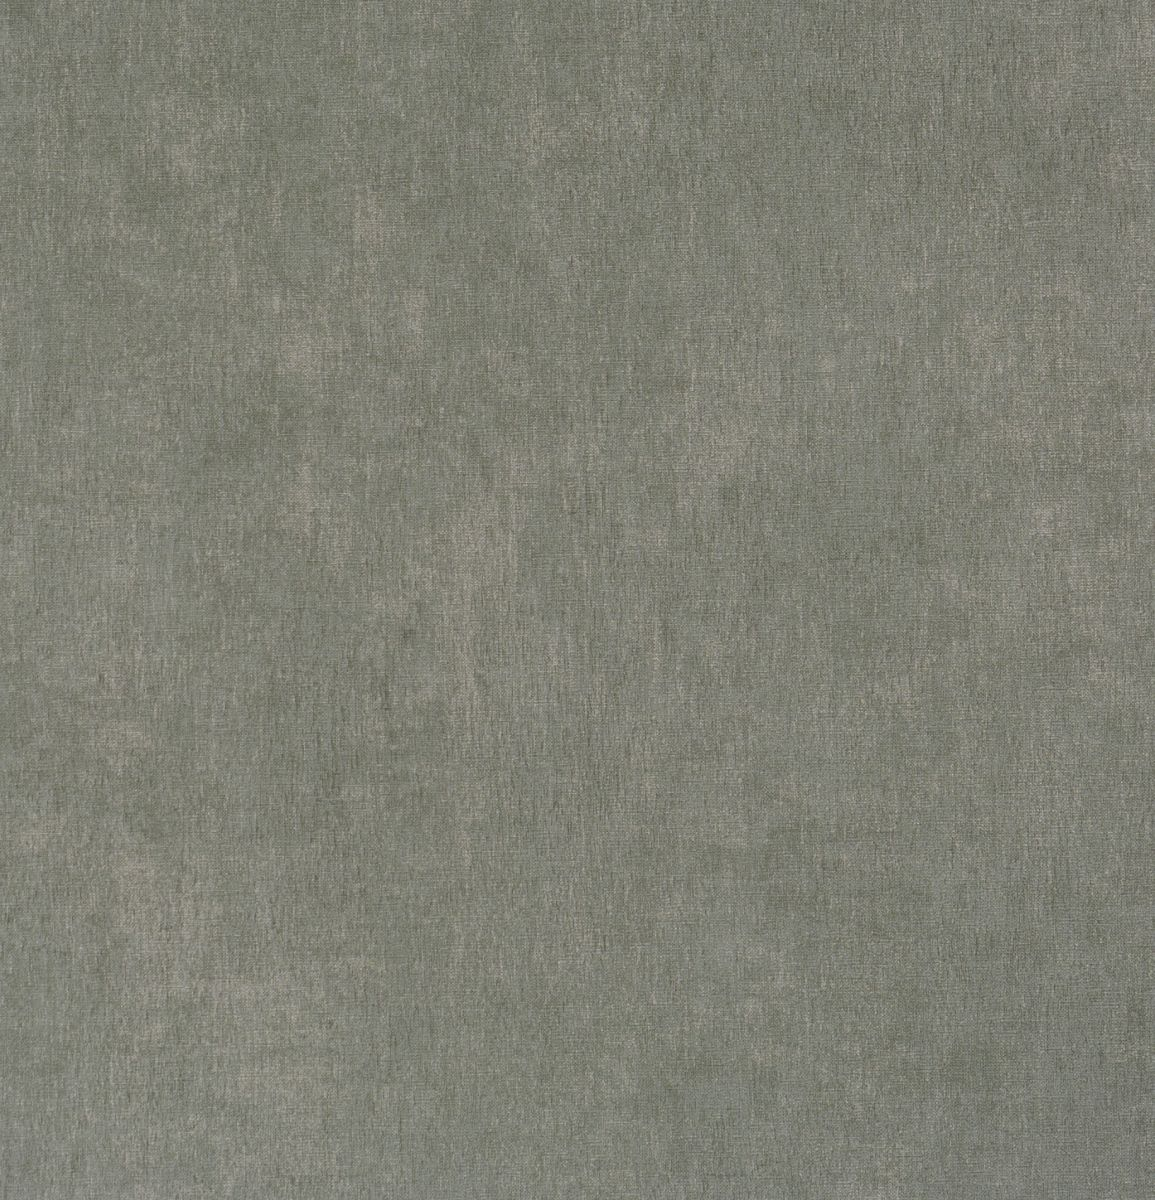 Hochwertige tapeten und stoffe vliestapete grau 50 - Vliestapete grau ...